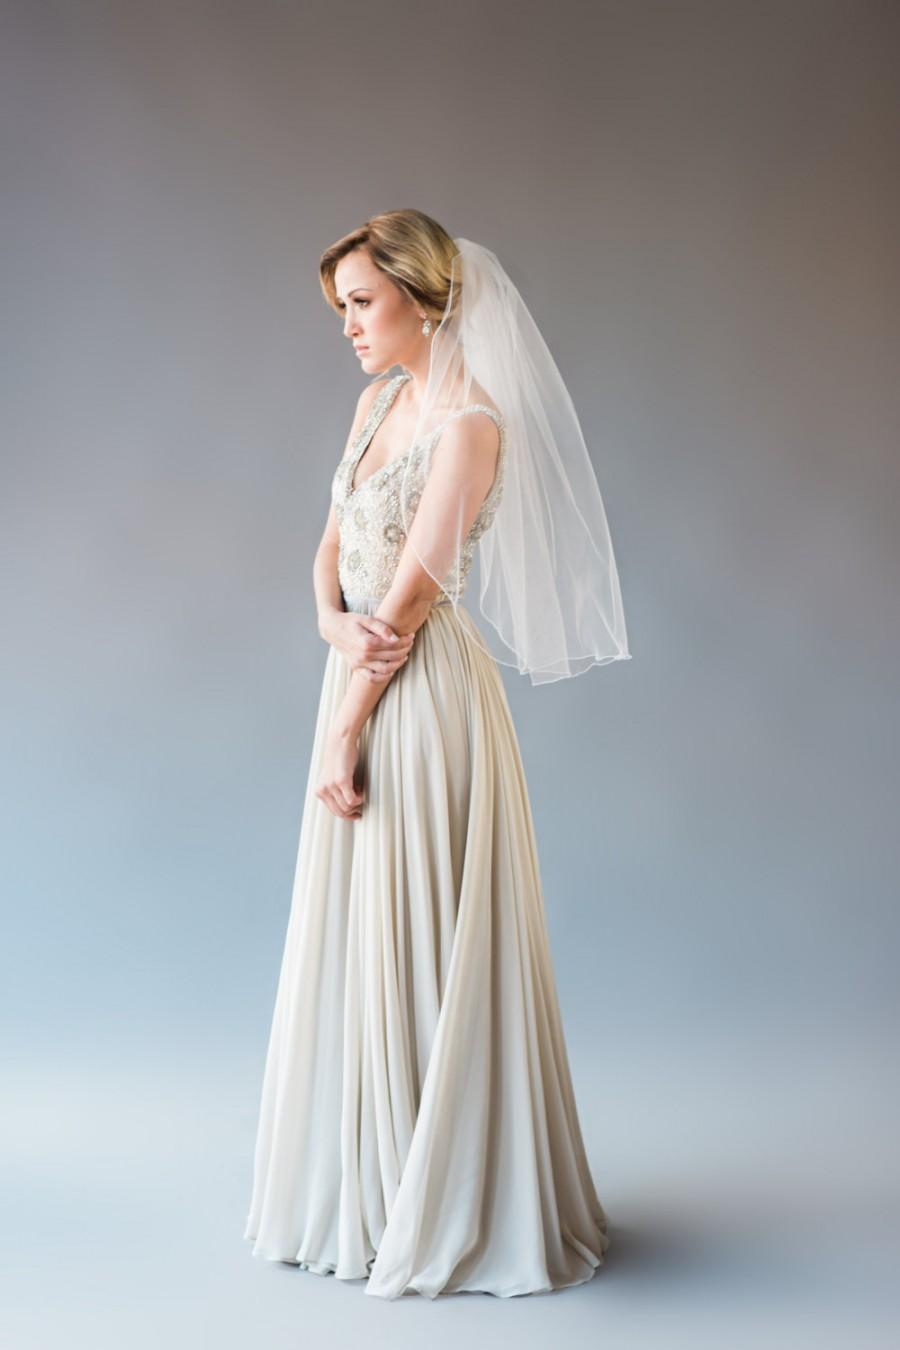 Mariage - Crystal Veil - Embroidered Edge Elbow Length Veil, Bridal Veil, Wedding Veil, Elbow Length Veil, Bridal Illusion Tulle